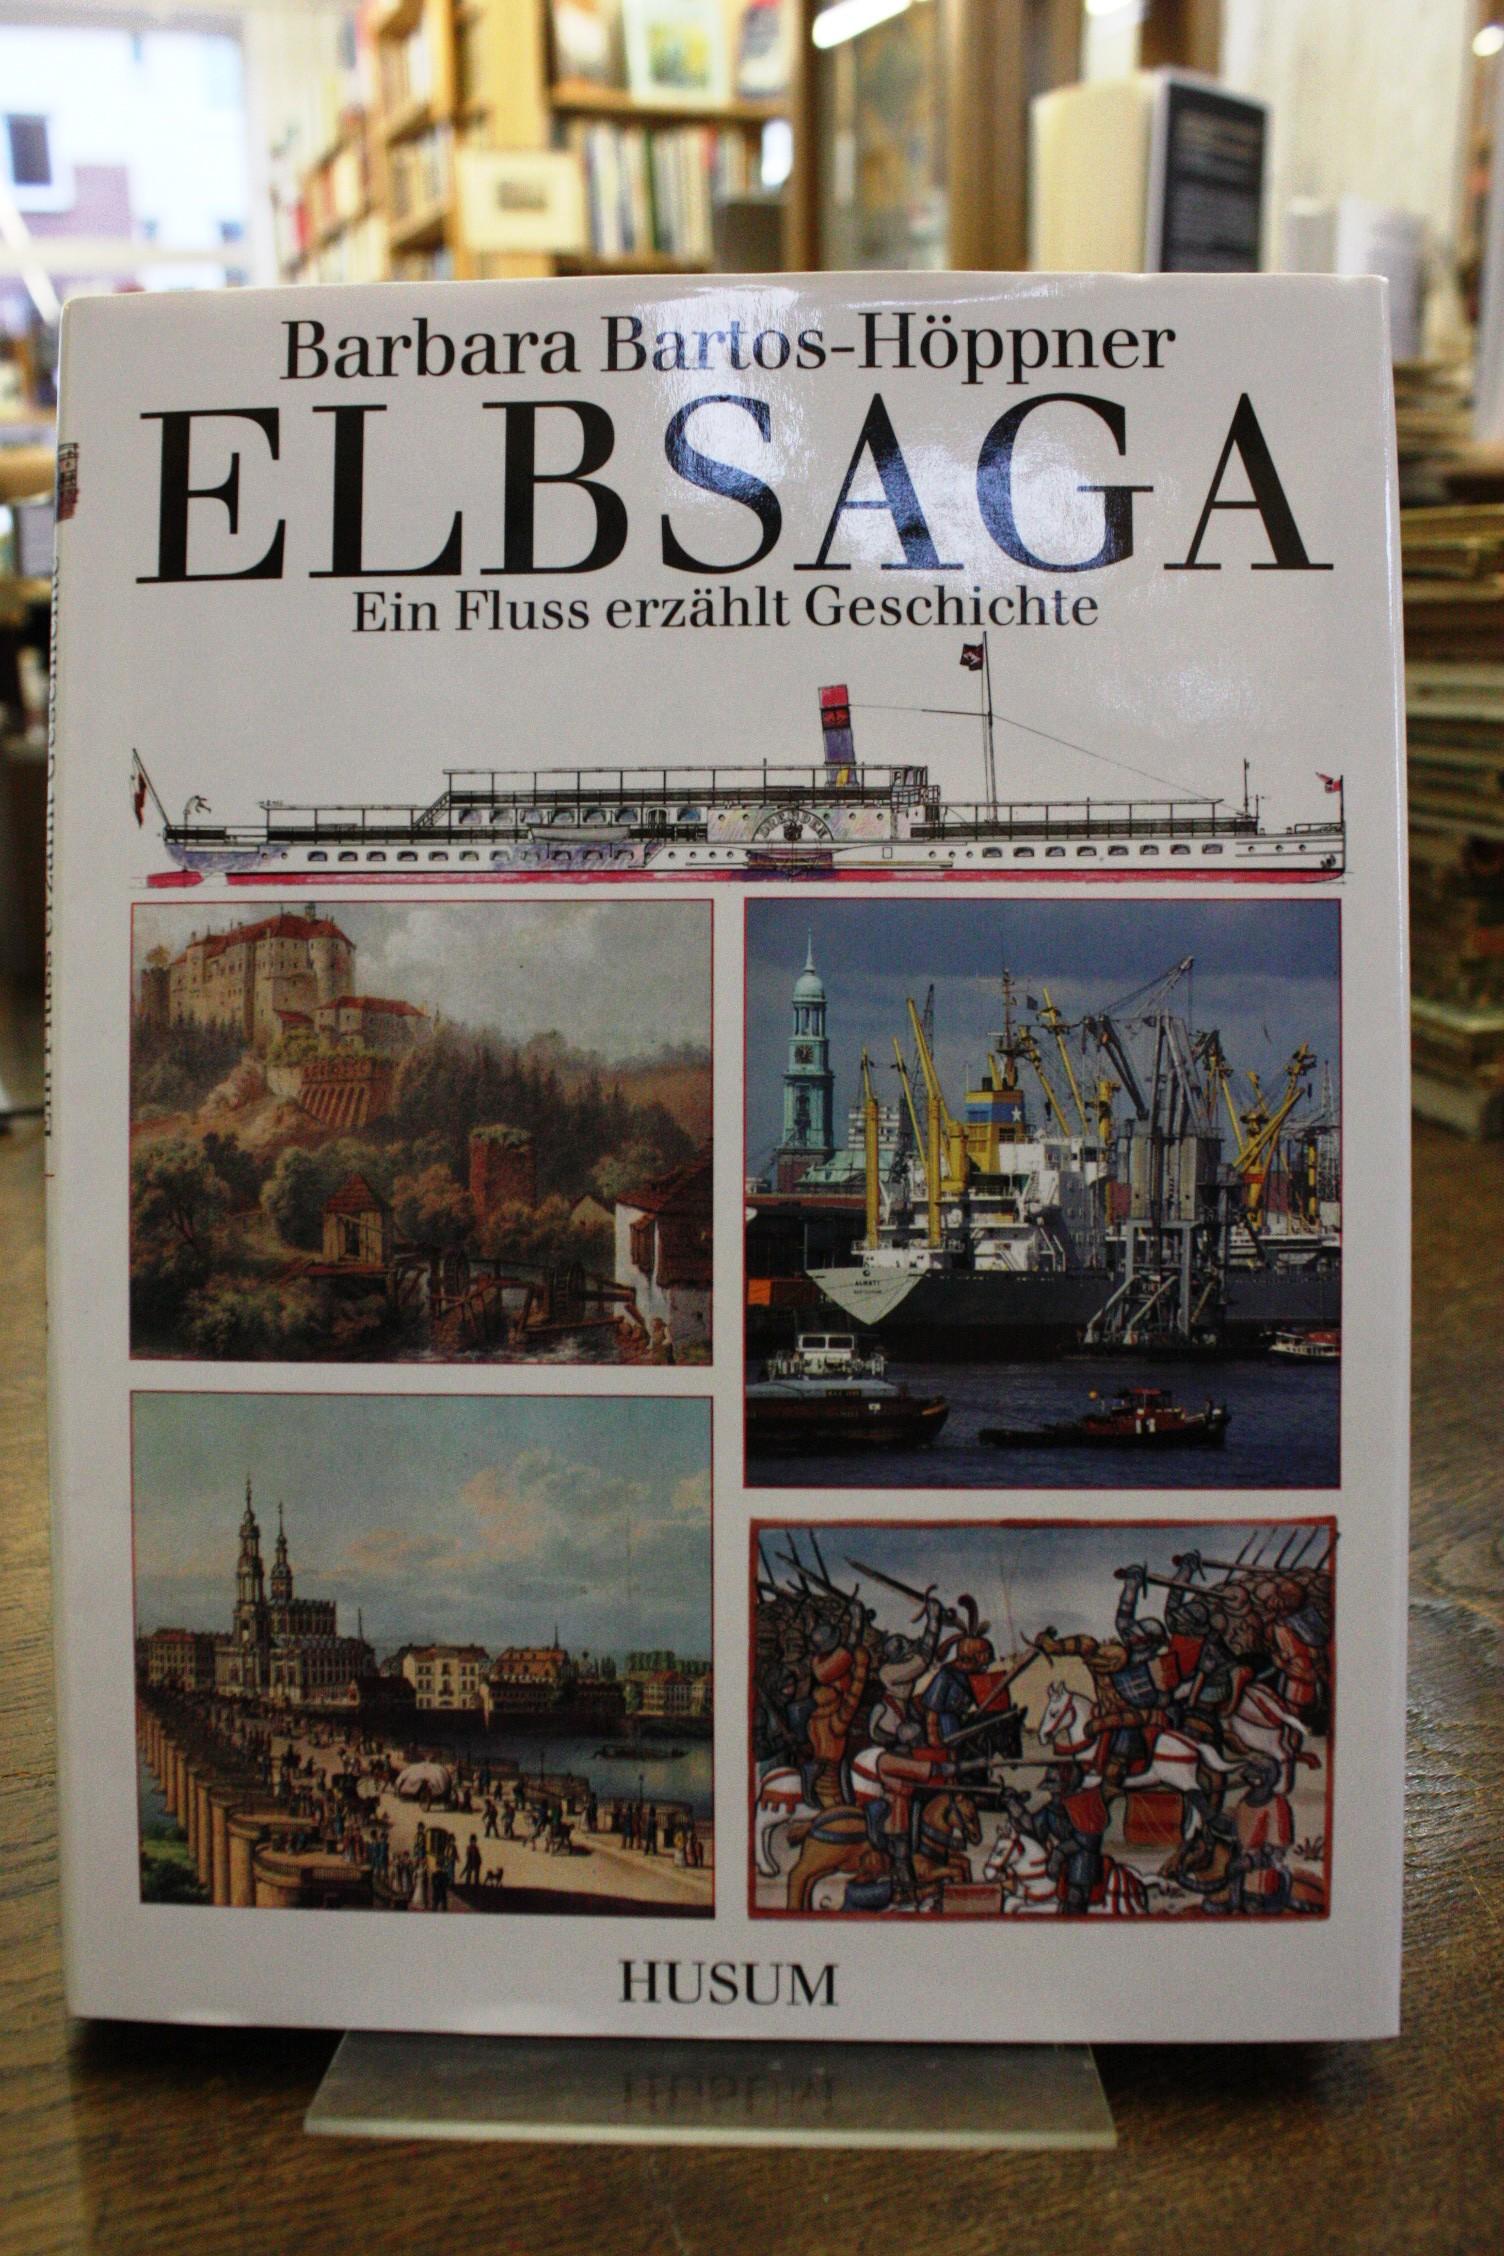 Elbsaga Ein Fluss erzählt Geschichte - Bartos-Höppner, Barbara